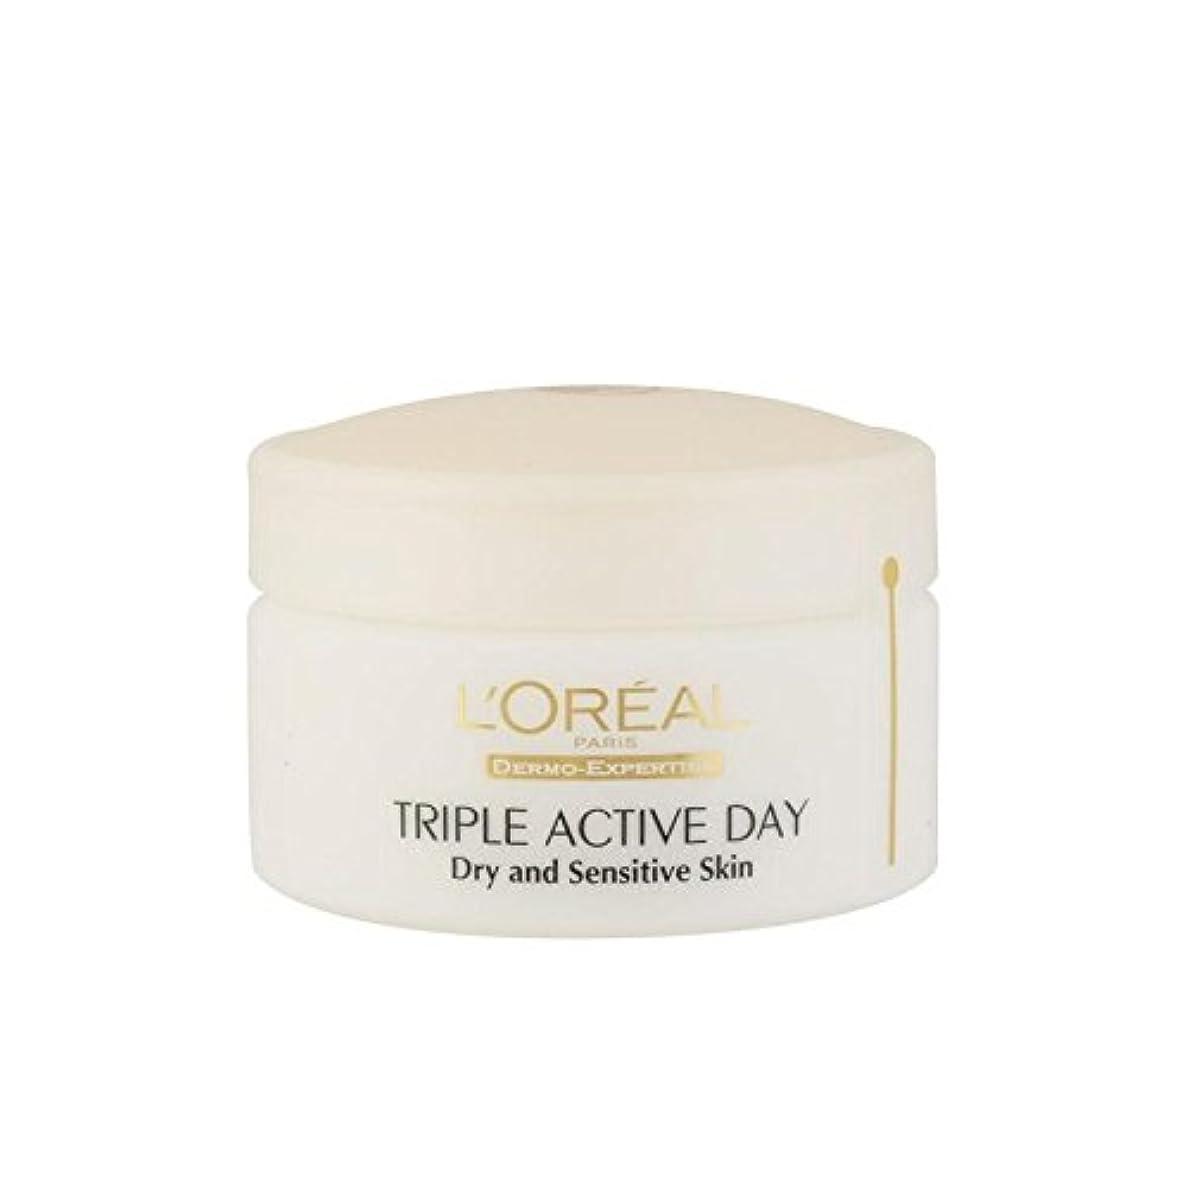 L'Oreal Paris Dermo Expertise Triple Active Day Multi-Protection Moisturiser - Dry/Sensitive Skin (50ml) (Pack...